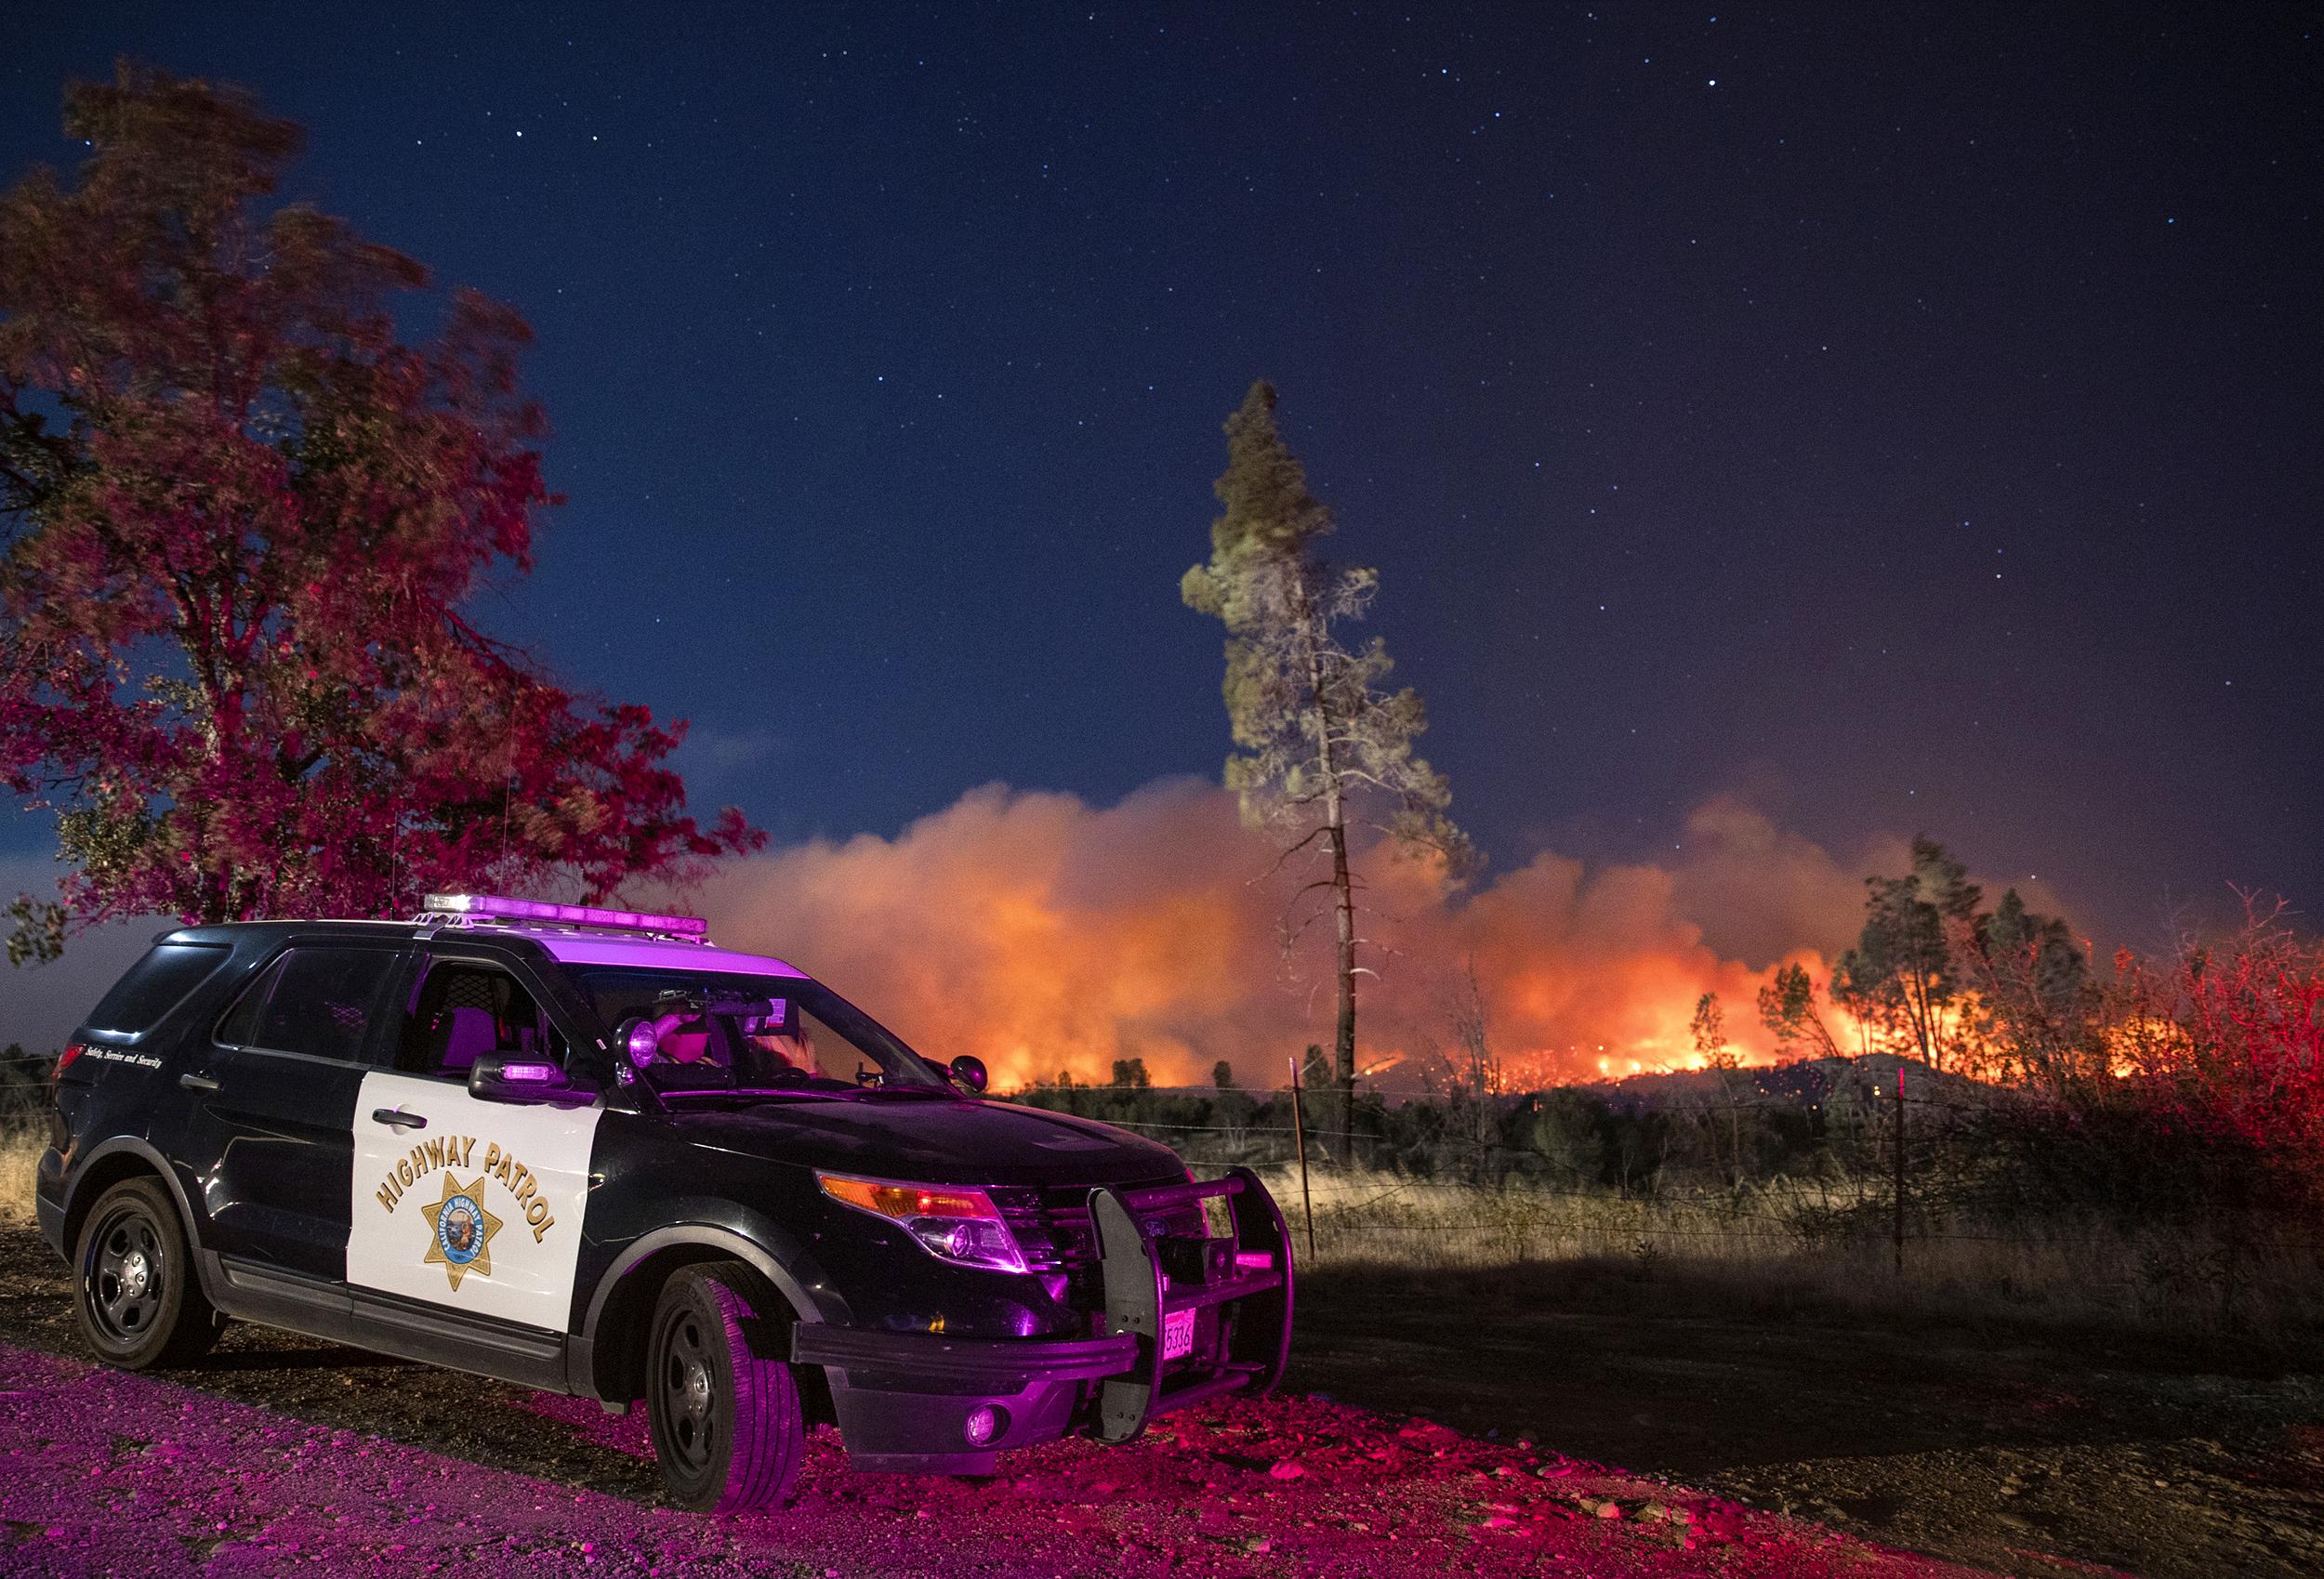 California utility PG&E is 'criminally liable' in deadly Zogg Fire, prosecutor says